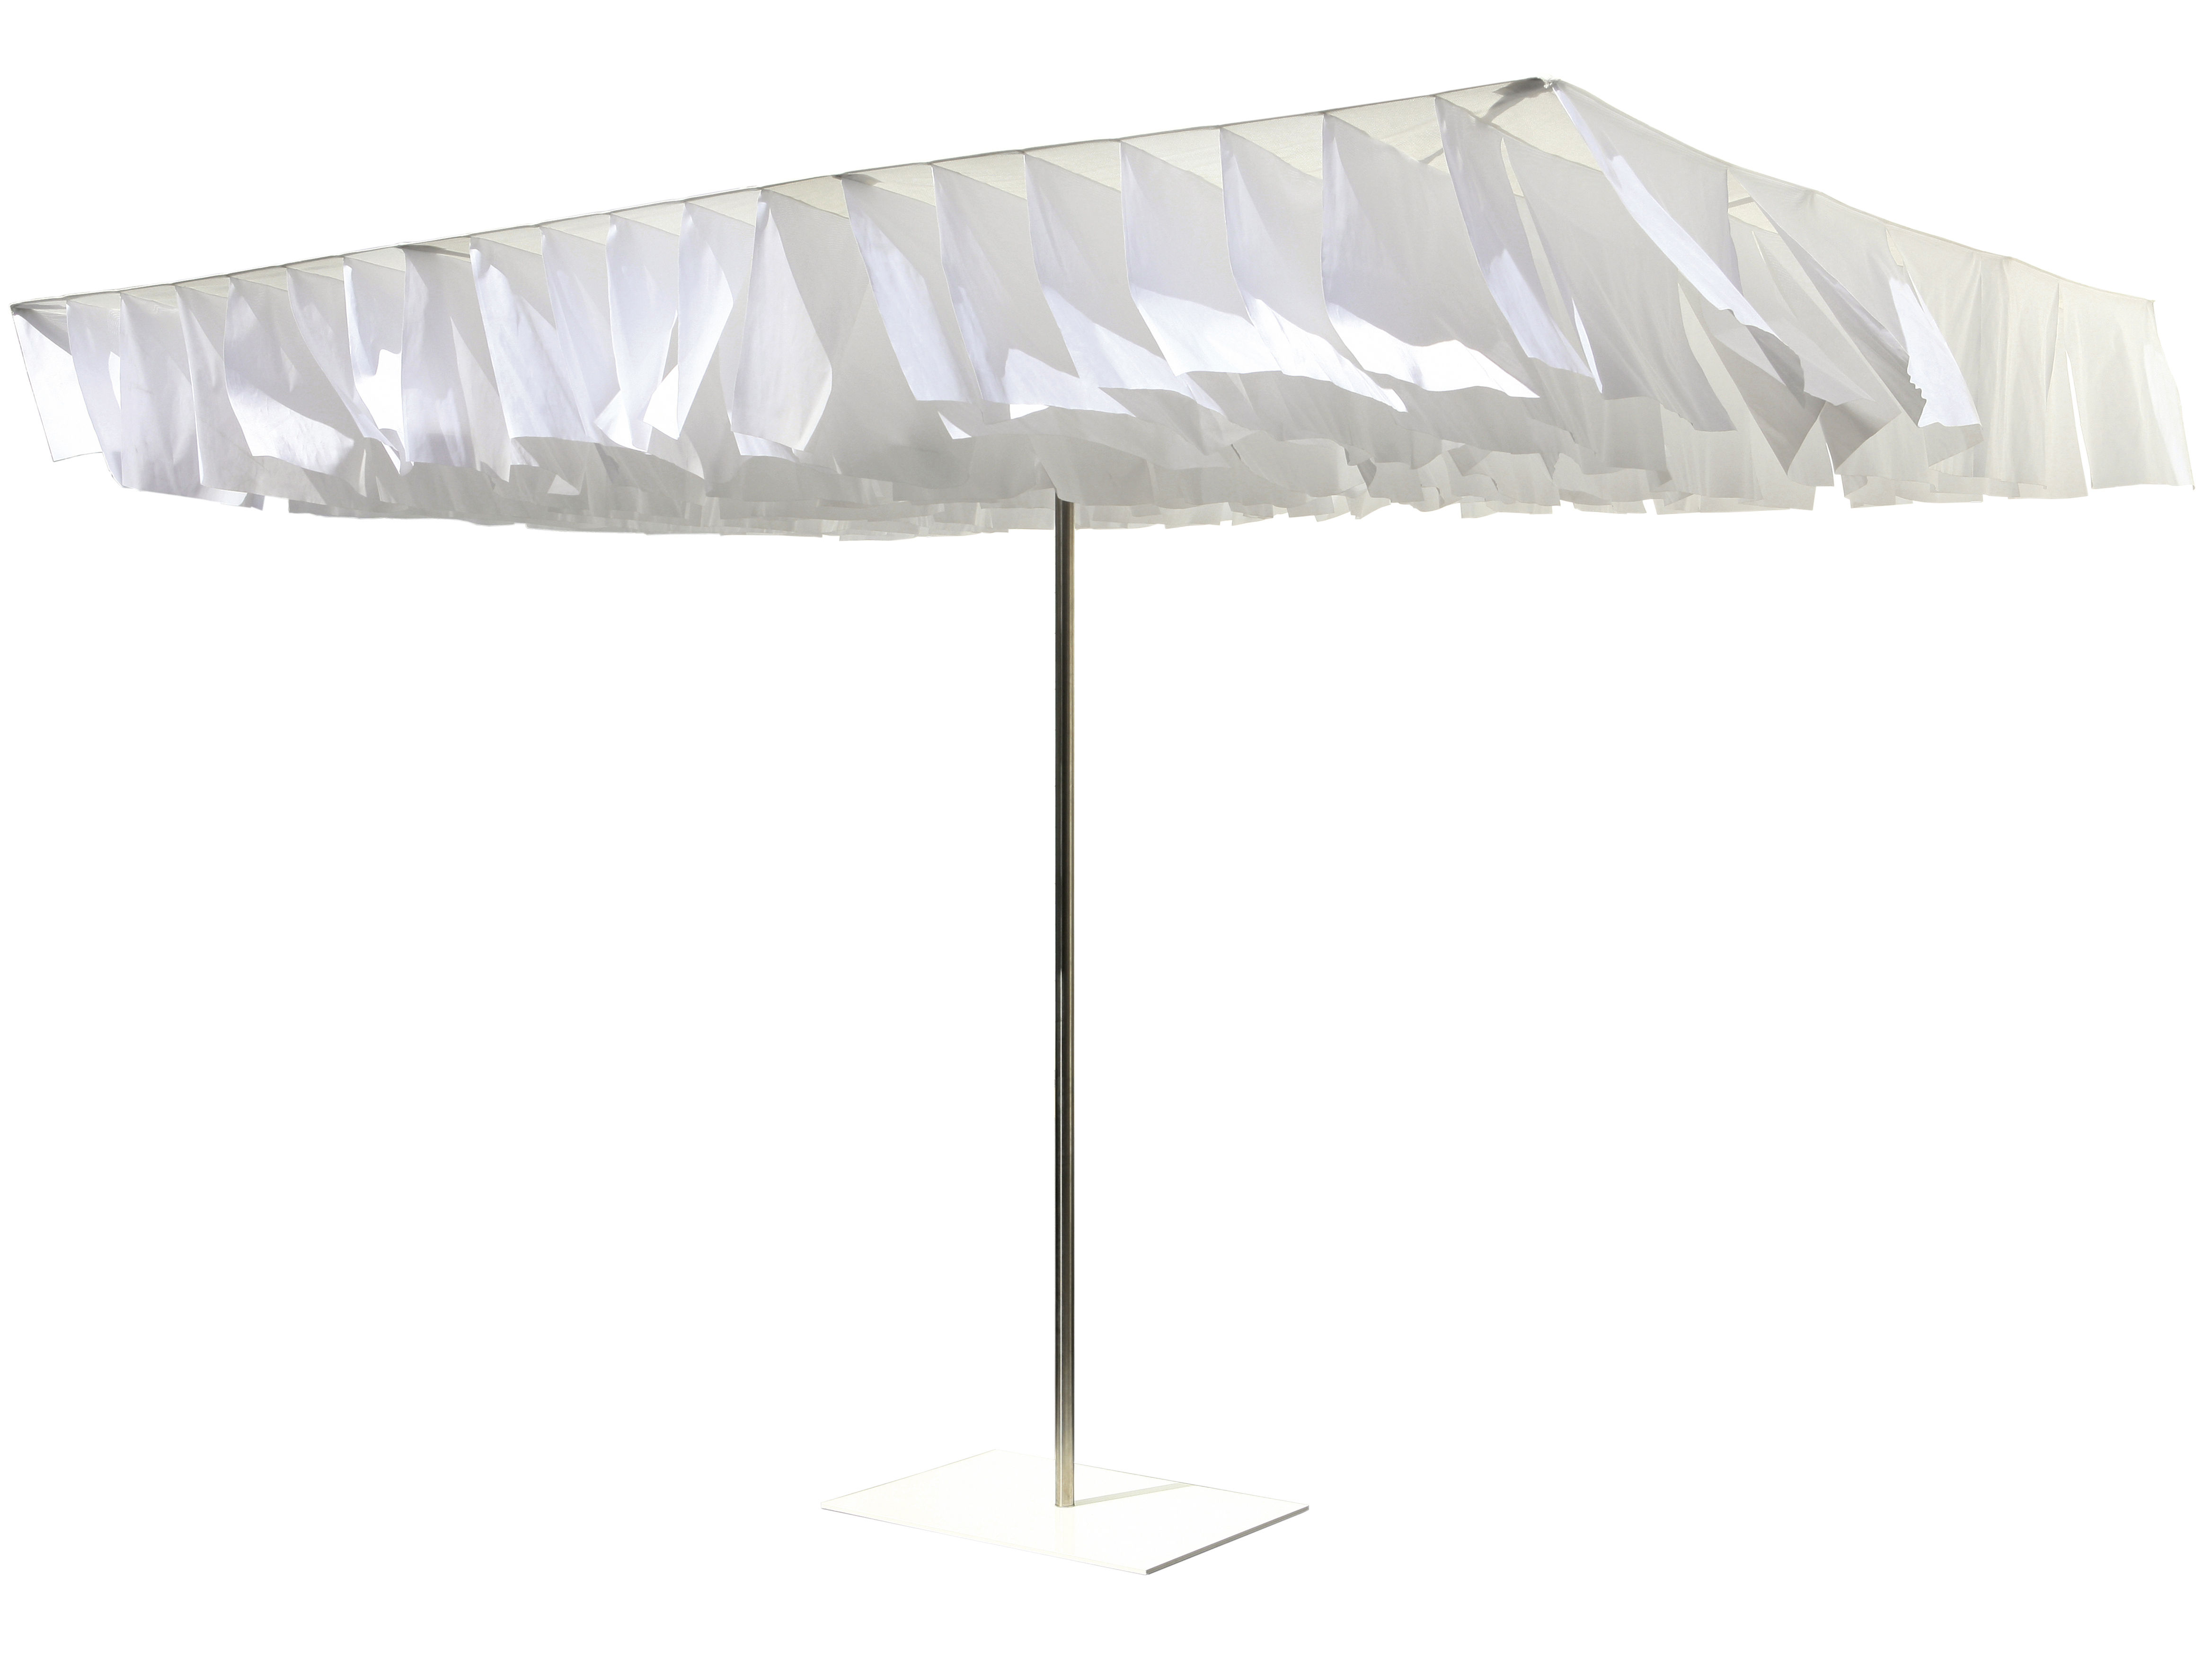 Outdoor - Parasols - Parasol Breezer - Symo - Parasol blanc / Toit blanc - Acier inoxydable, Tissu polyester